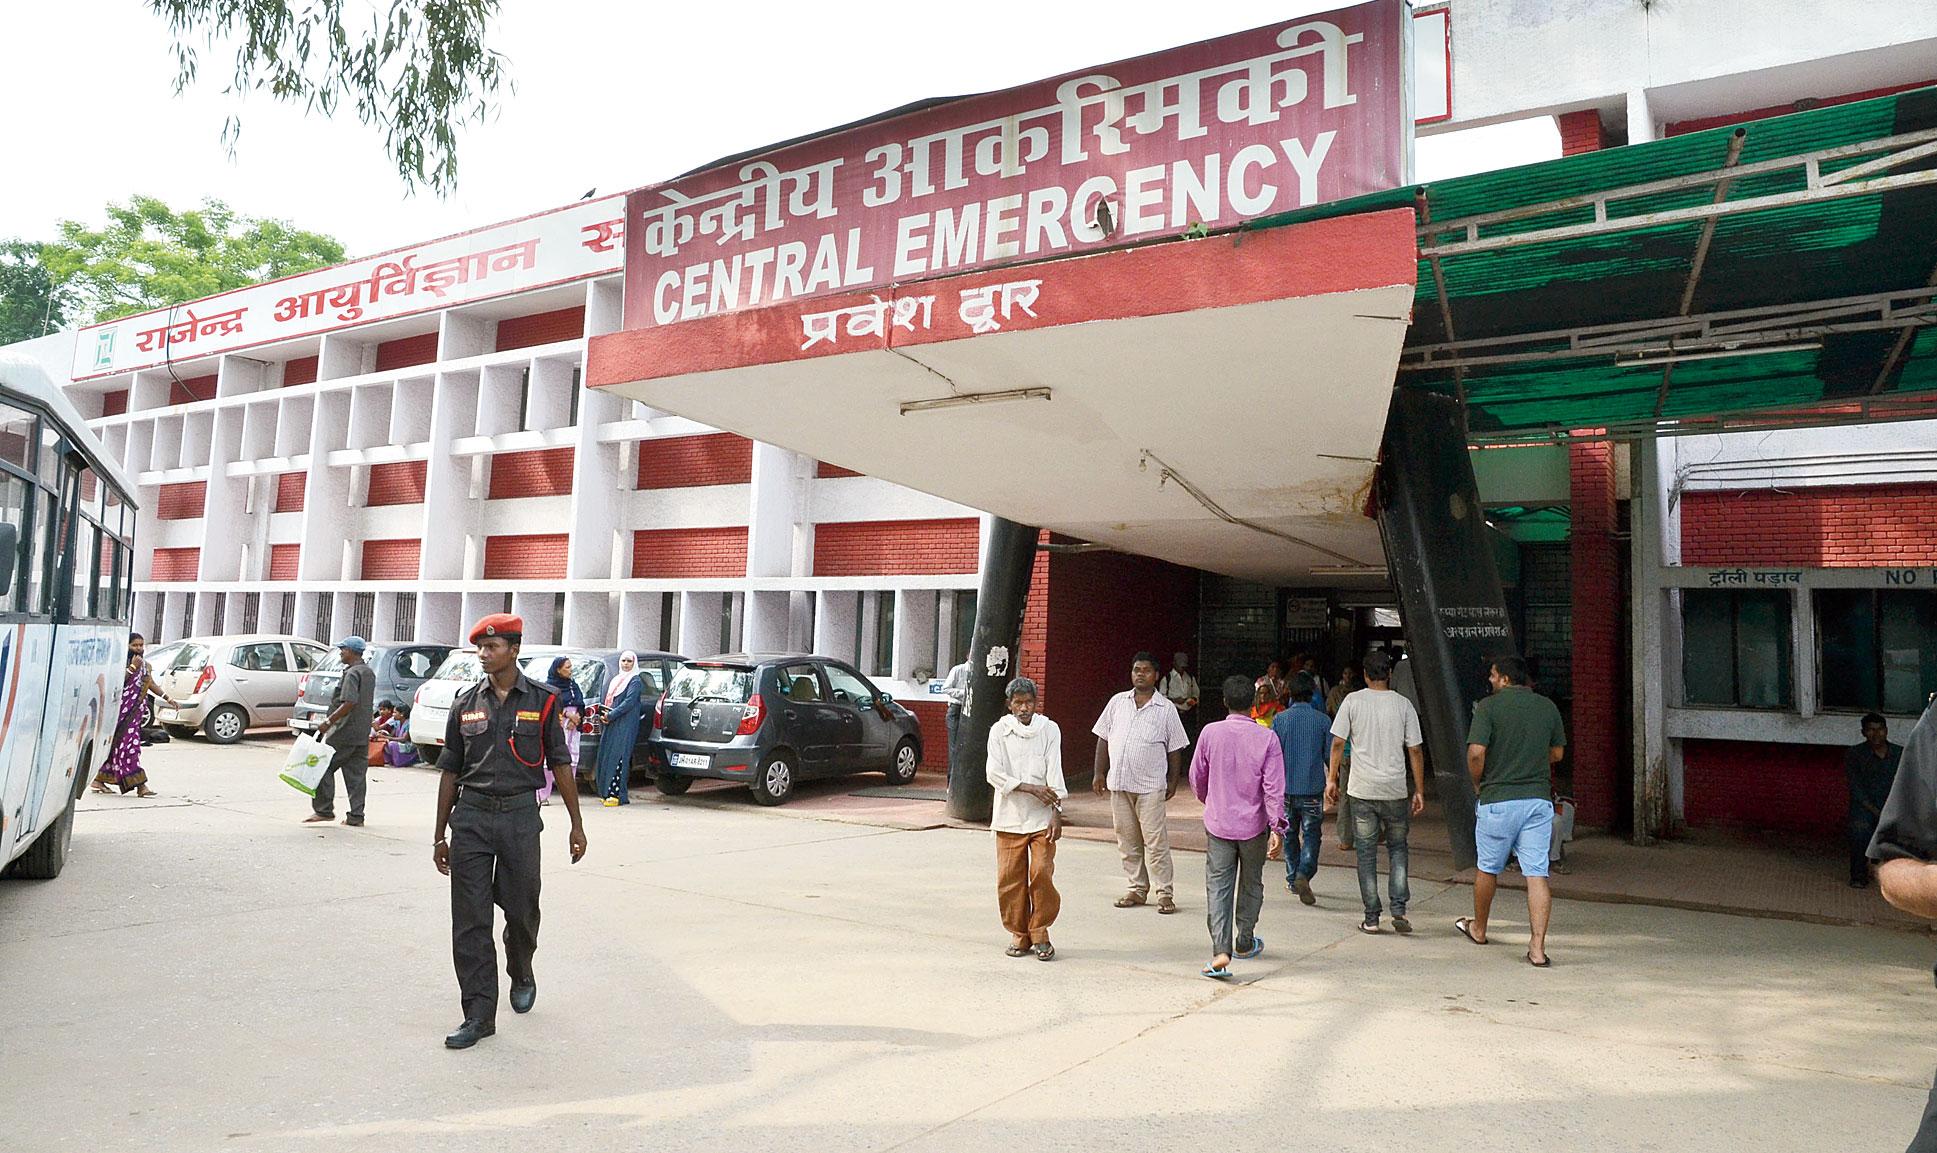 RIMS in Ranchi where Lohardaga SP's driver Ramratan Singh died during treatment